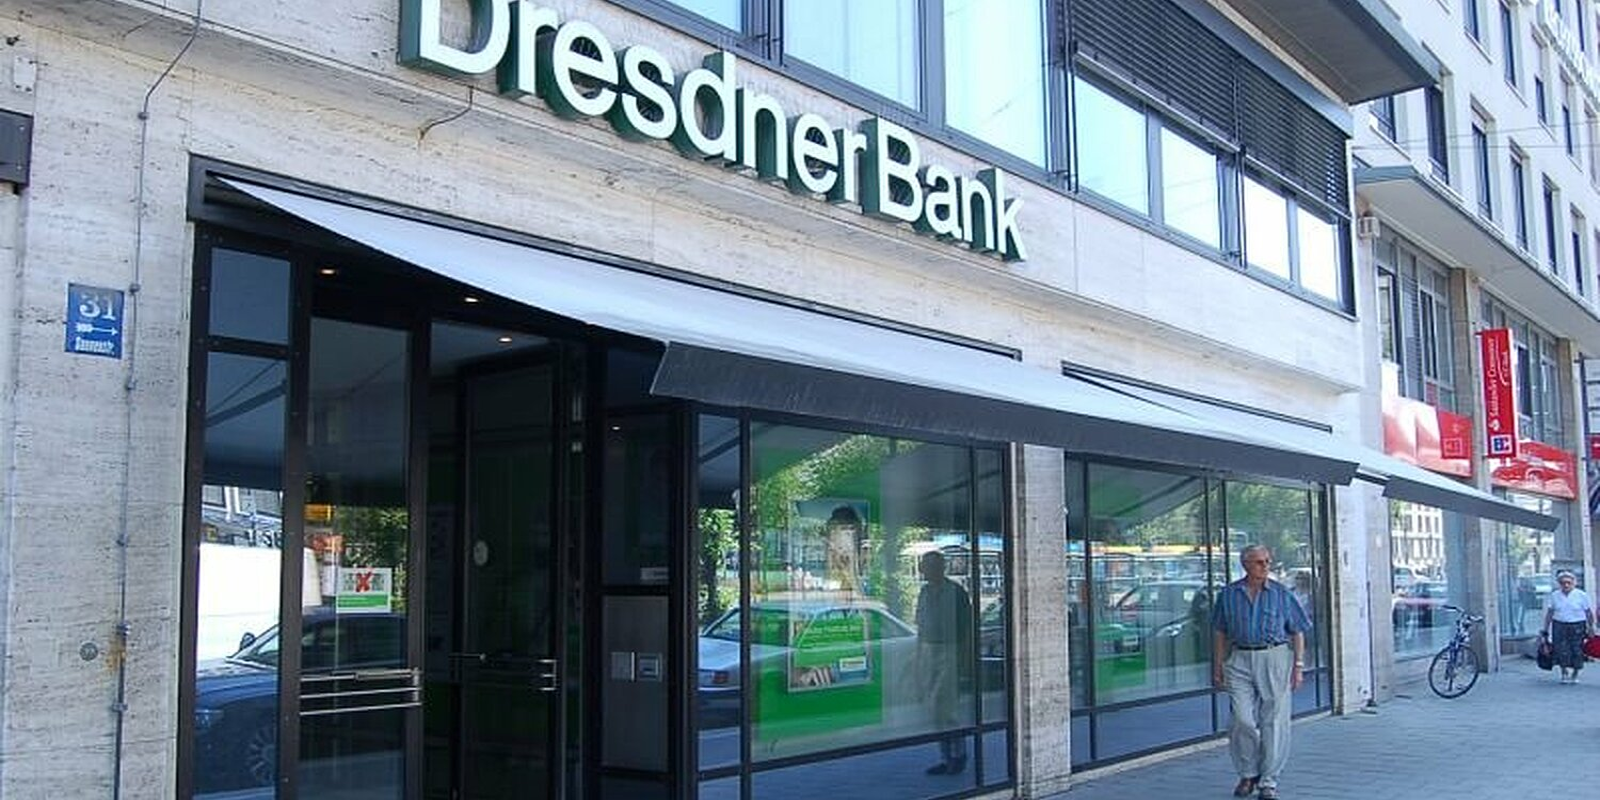 Commerzbank Frankfurter Tor